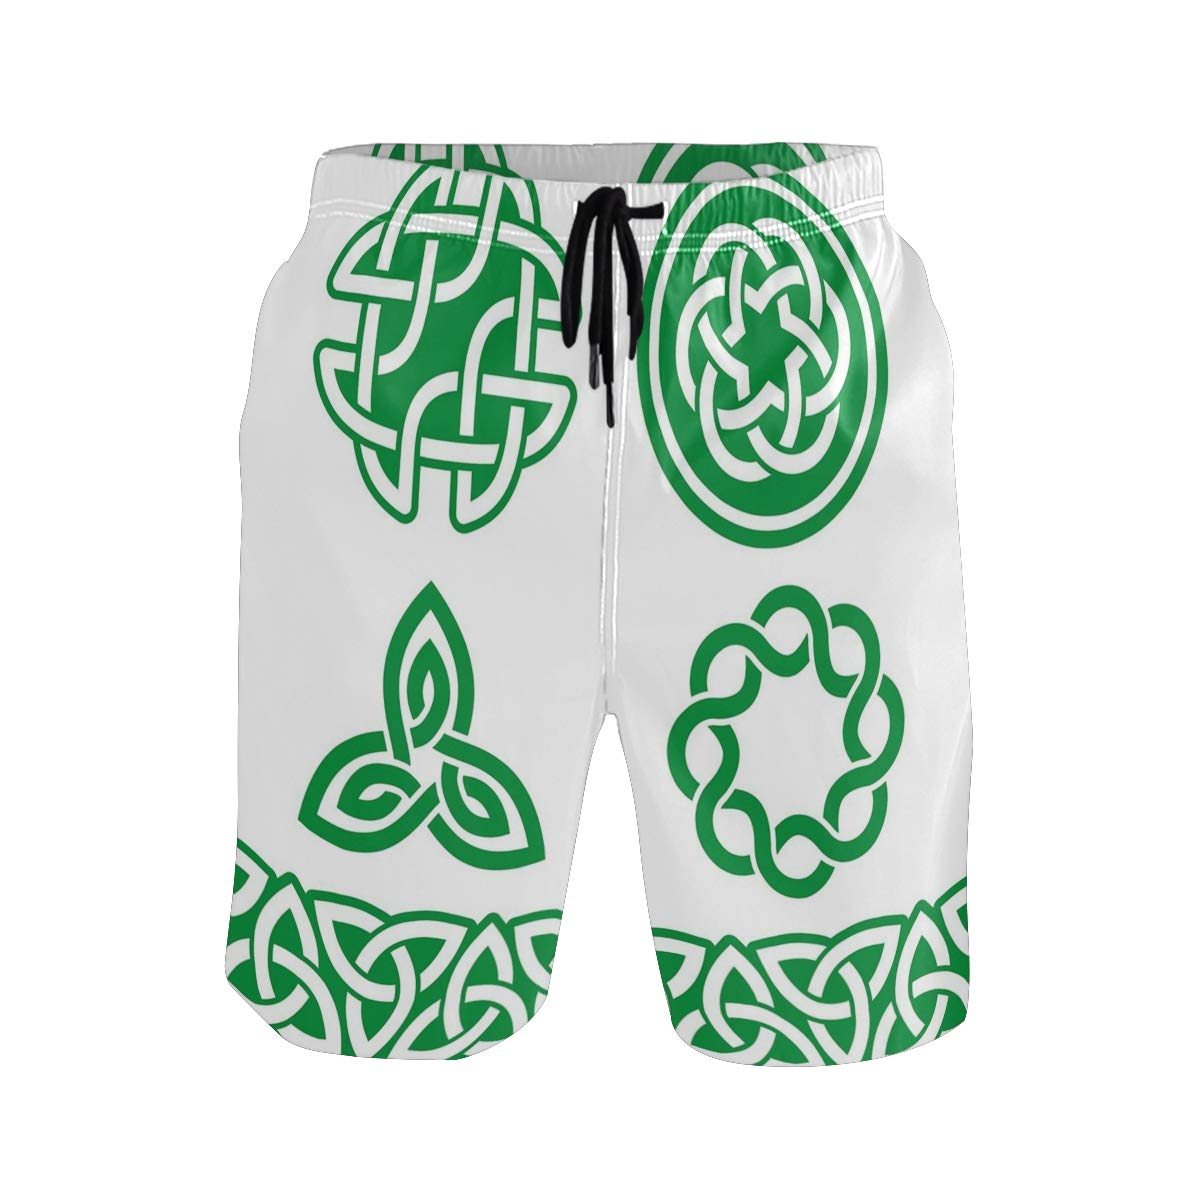 COVASA Mens Summer ShortsMedieval Ancient Knots Symbols Braided Design Religio